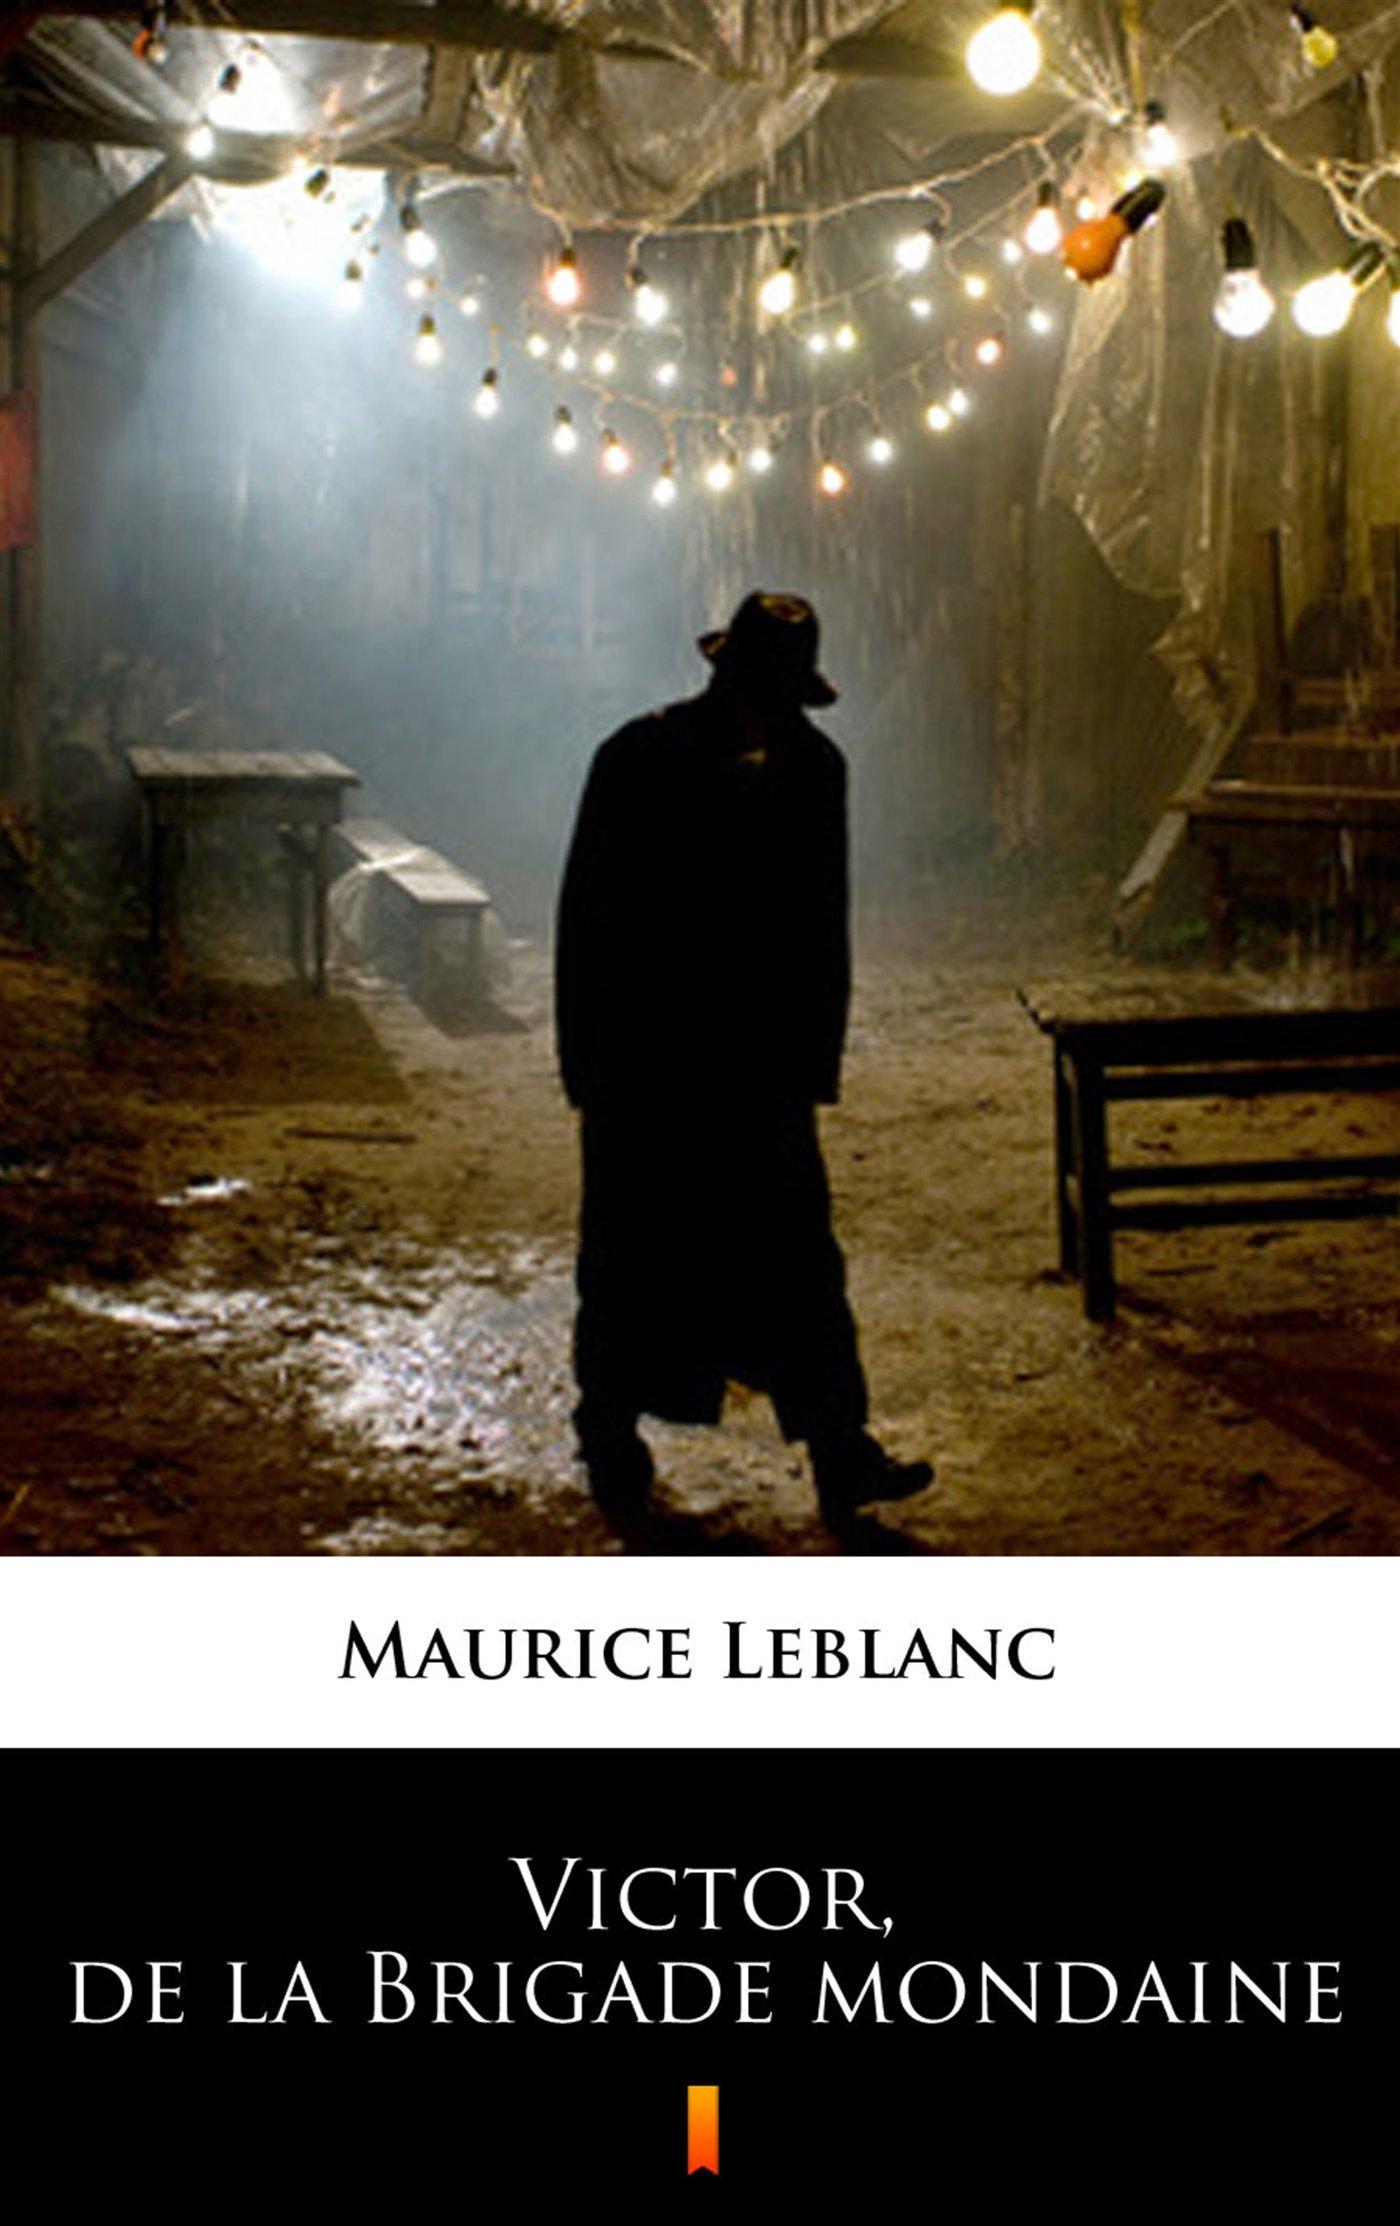 Victor, de la Brigade mondaine - Ebook (Książka na Kindle) do pobrania w formacie MOBI